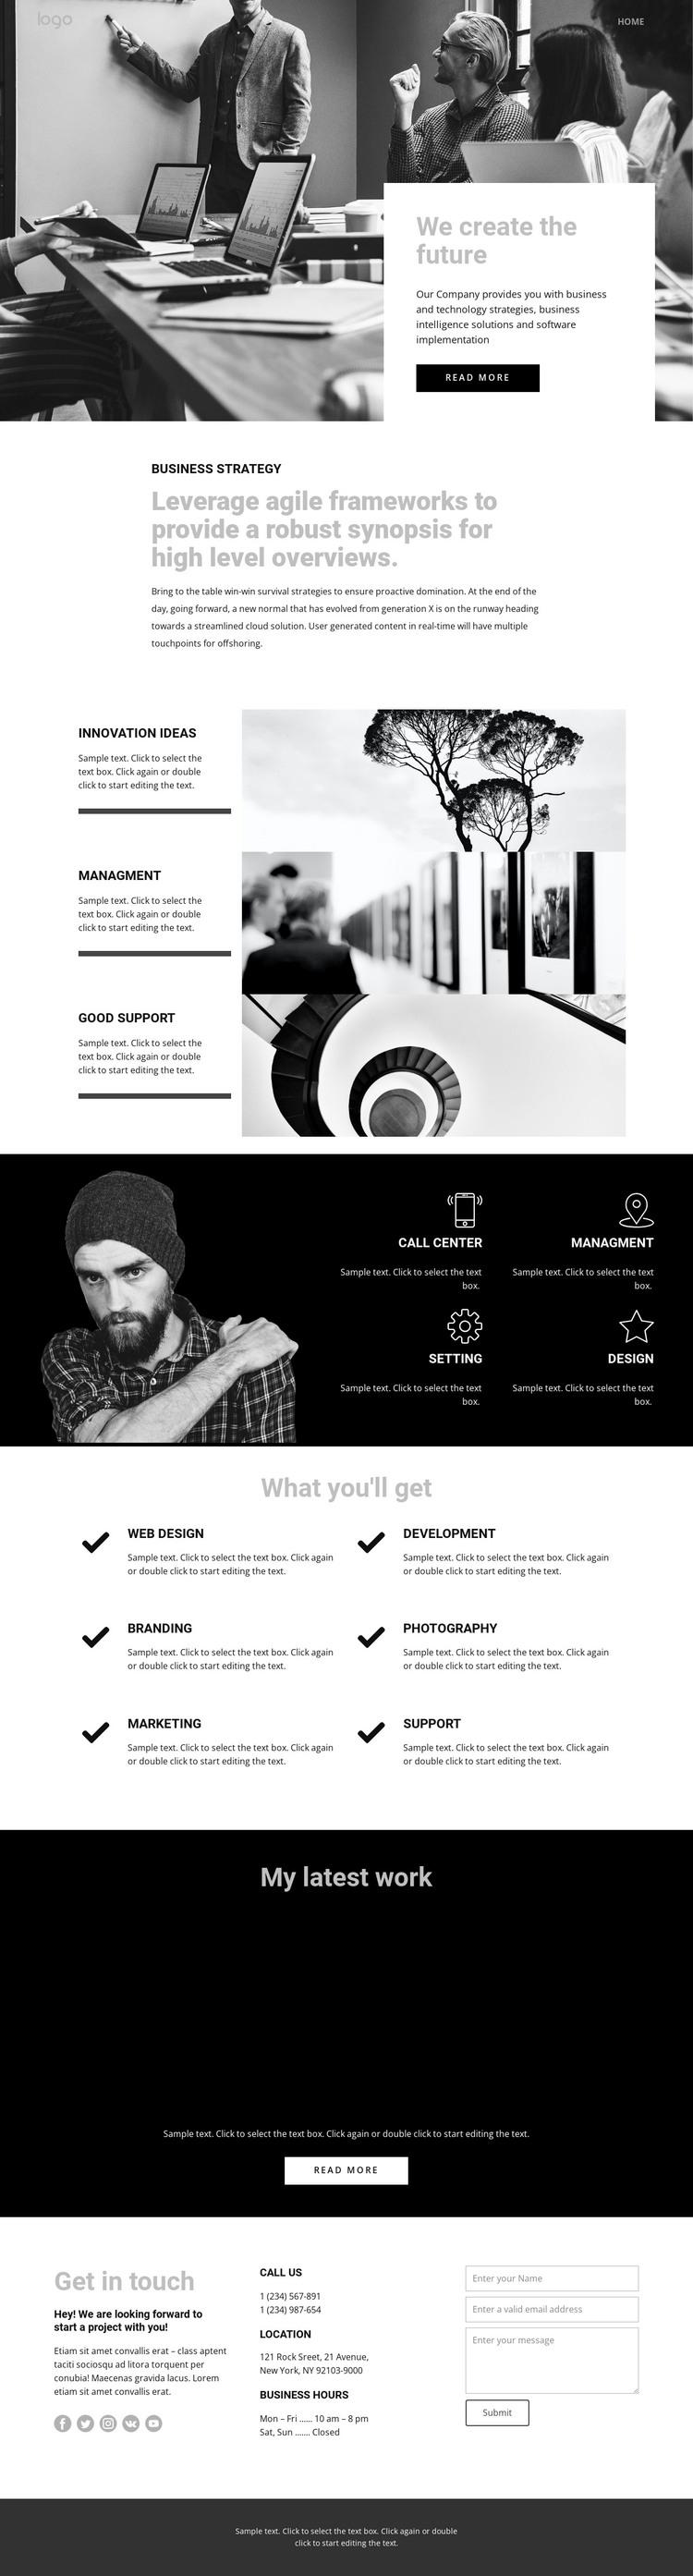 Future of corporate business Web Design